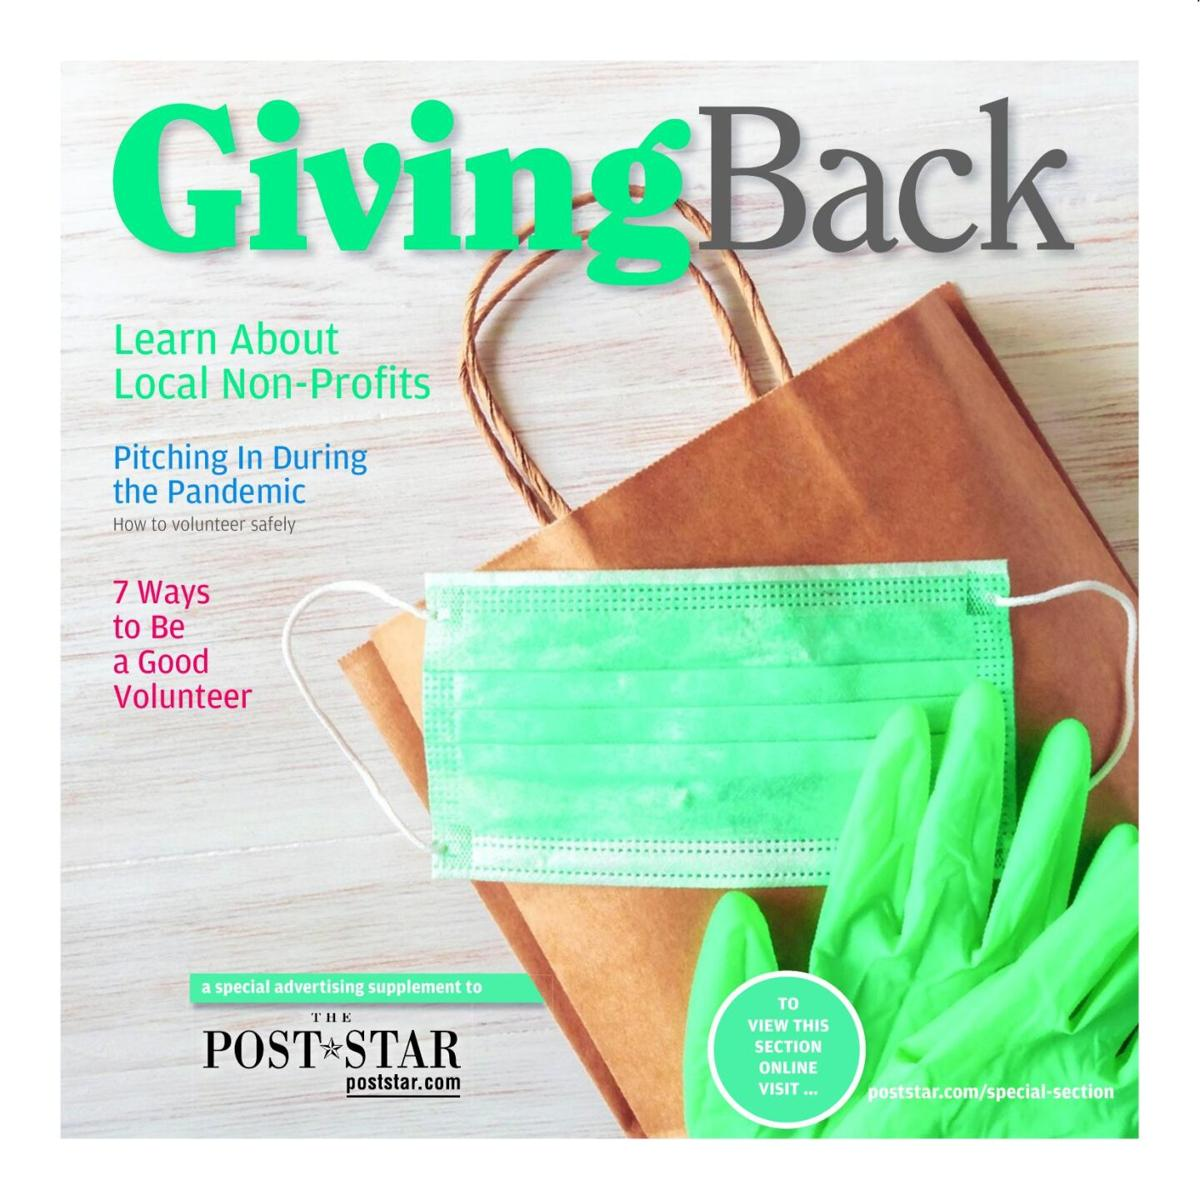 Giving Back 11.29.2020